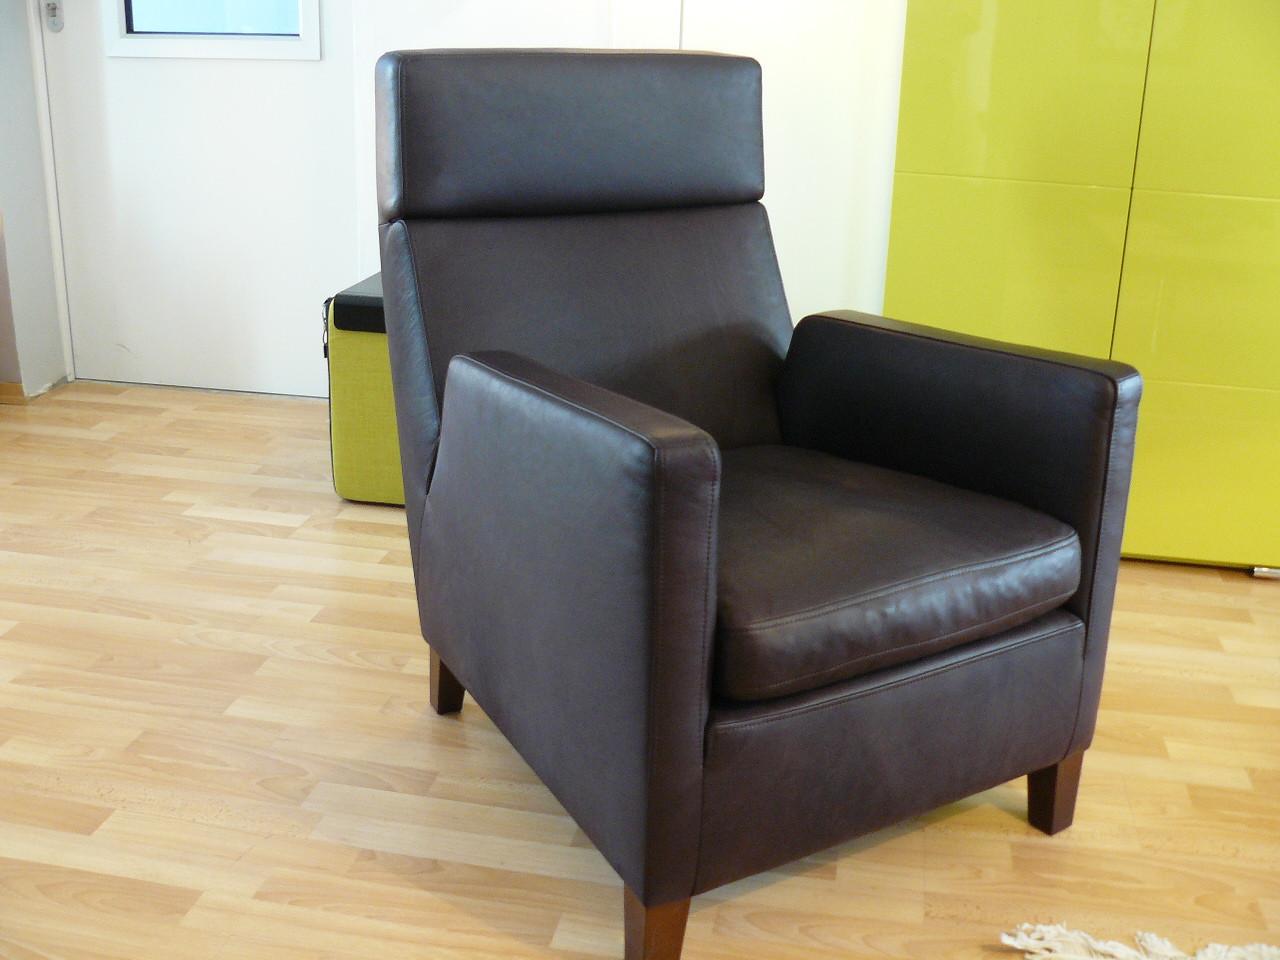 Machalke Luxus Sessel